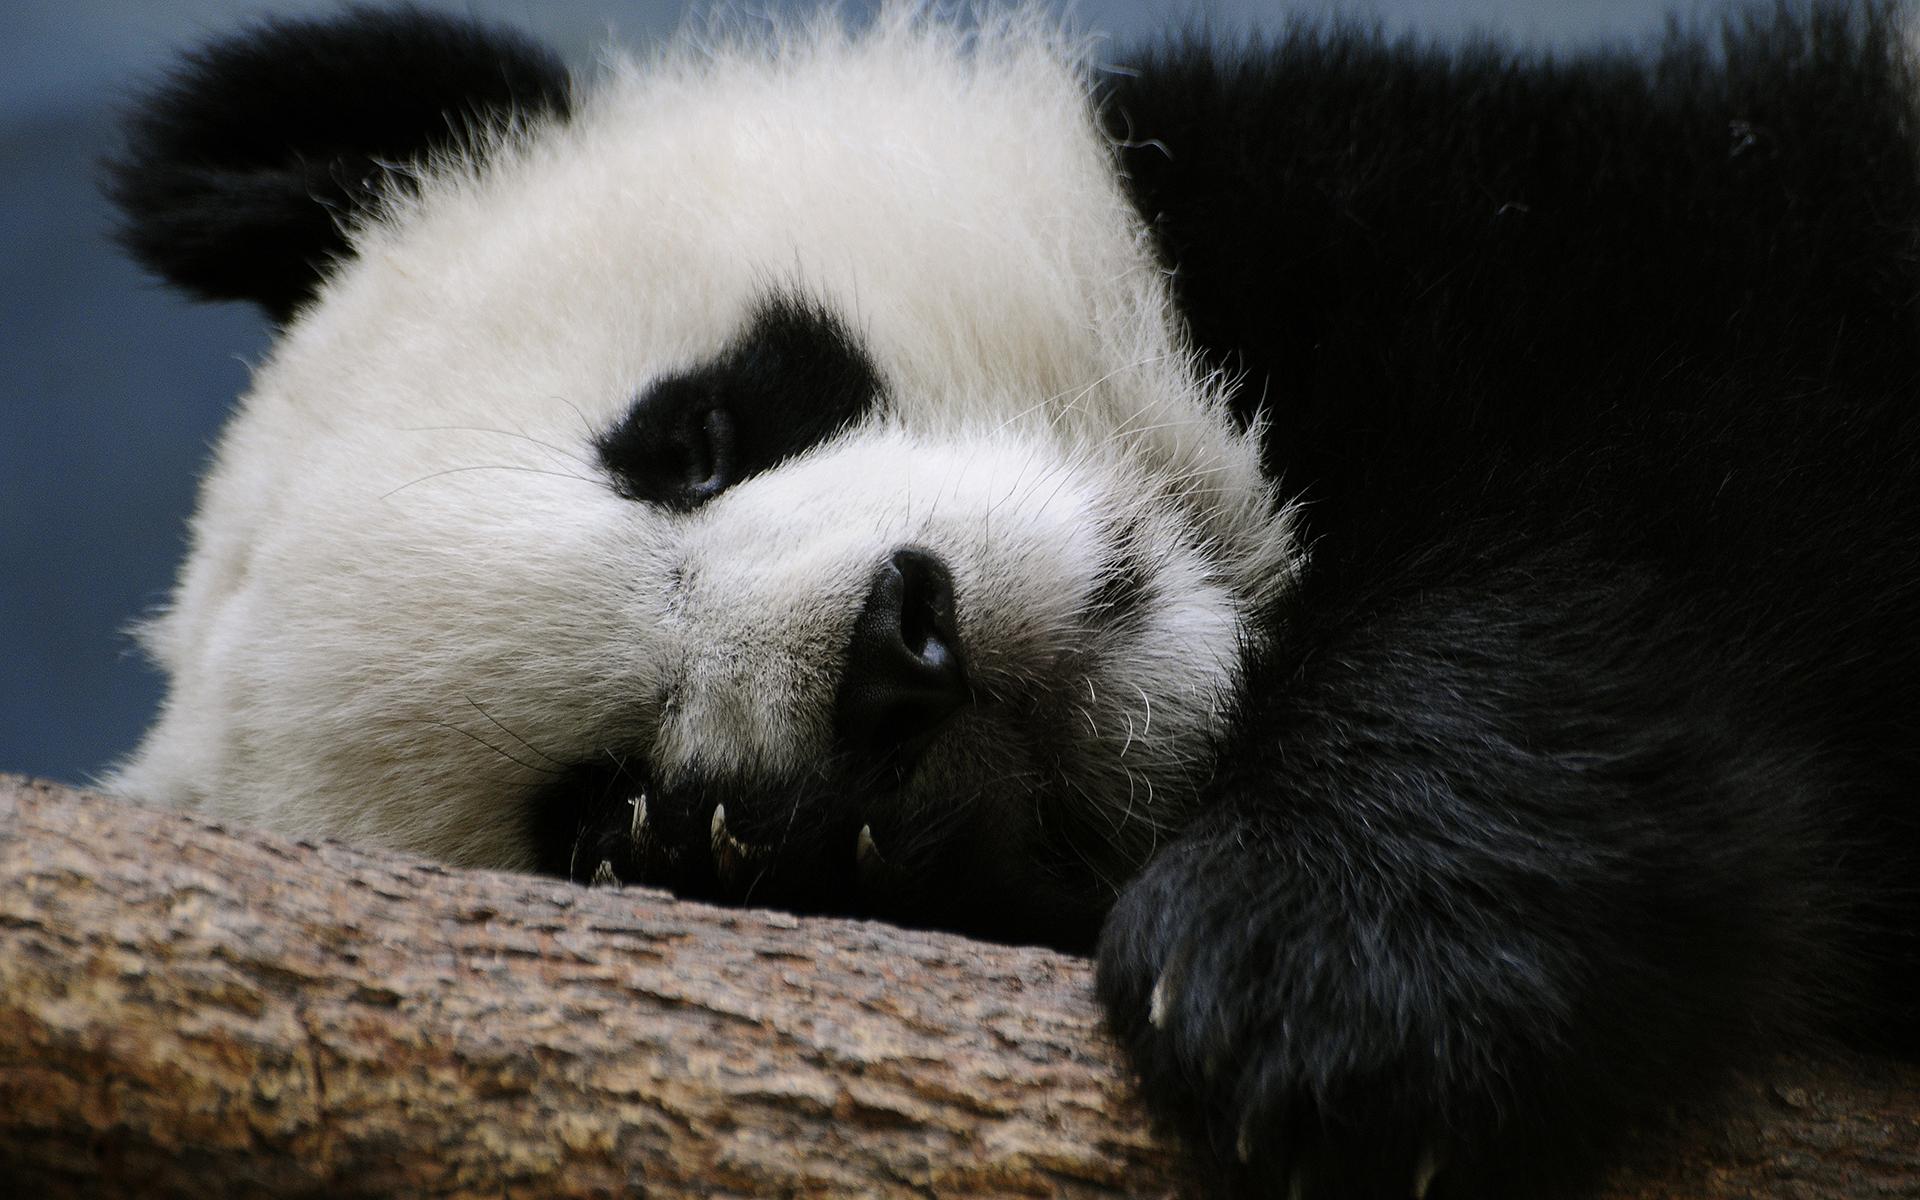 Sleepy Panda - Diaper bags, re-invented for modern parents by Sleepy Panda — Kickstarter